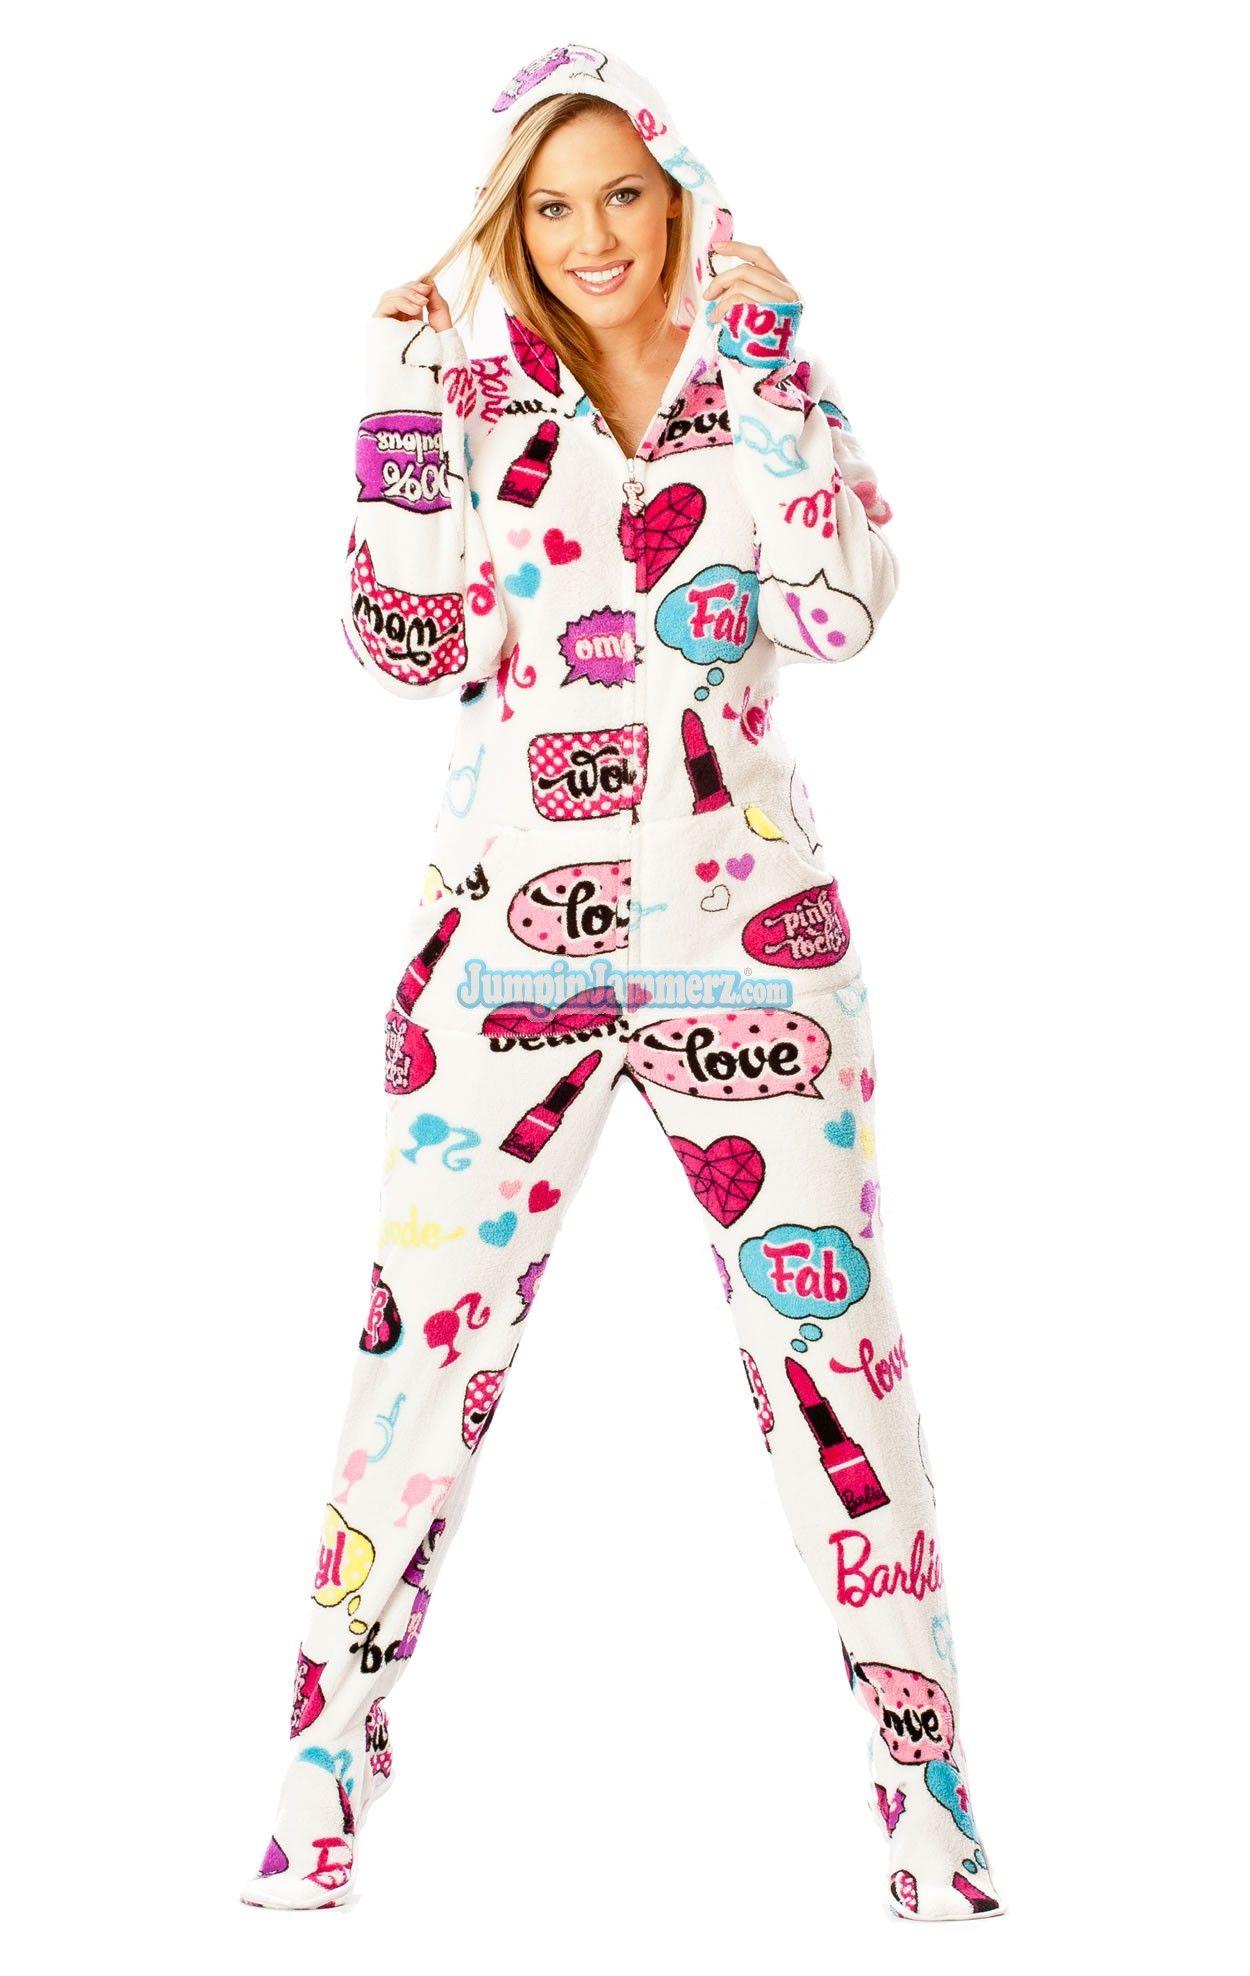 Onesies Pajamas. Showing 48 of results that match your query. Toast & Jammies Blanket Sleeper Pajamas (Baby Girls) Product - komar boys' kids raccoon hooded blanket sleeper. $ 99 - $ Product Title. komar boys' kids raccoon hooded blanket sleeper. Product - DC Comics Boys' Batman Superhero Onesie Pajamas, All-in-One Set.